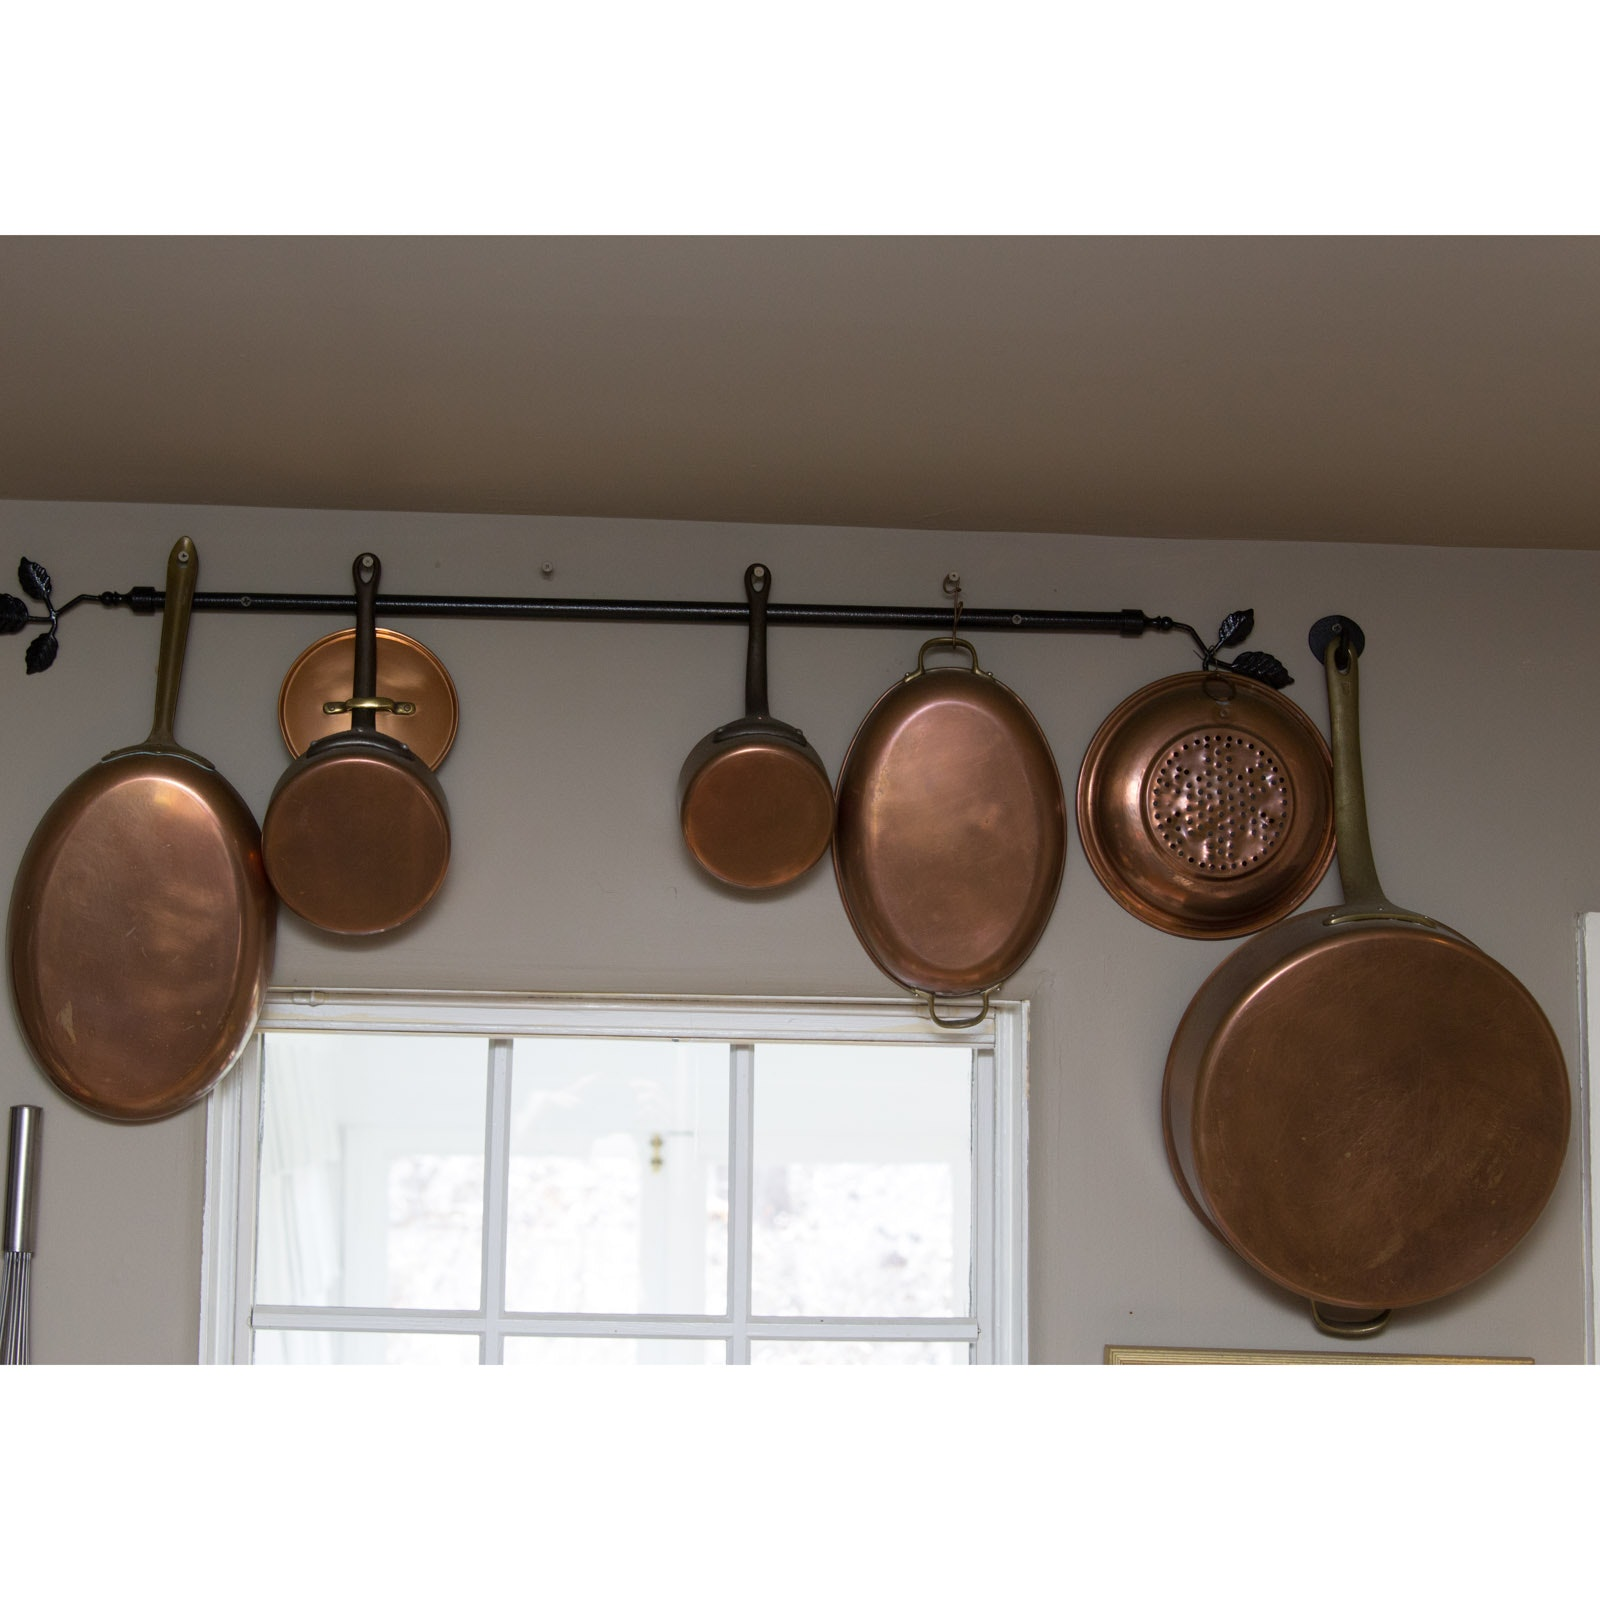 Vintage Copper Pan Set